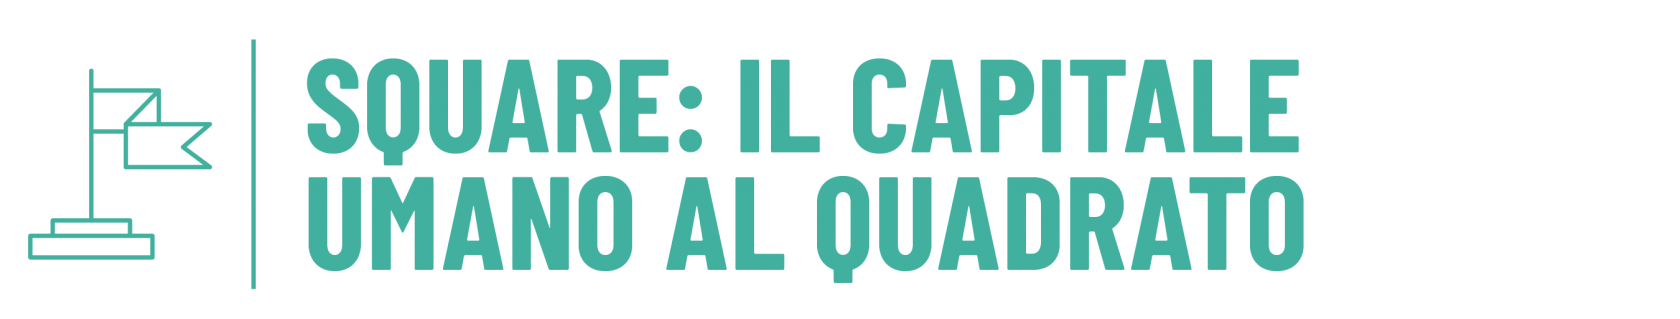 Header_Leadership_IN-Square_Tavola disegno 1